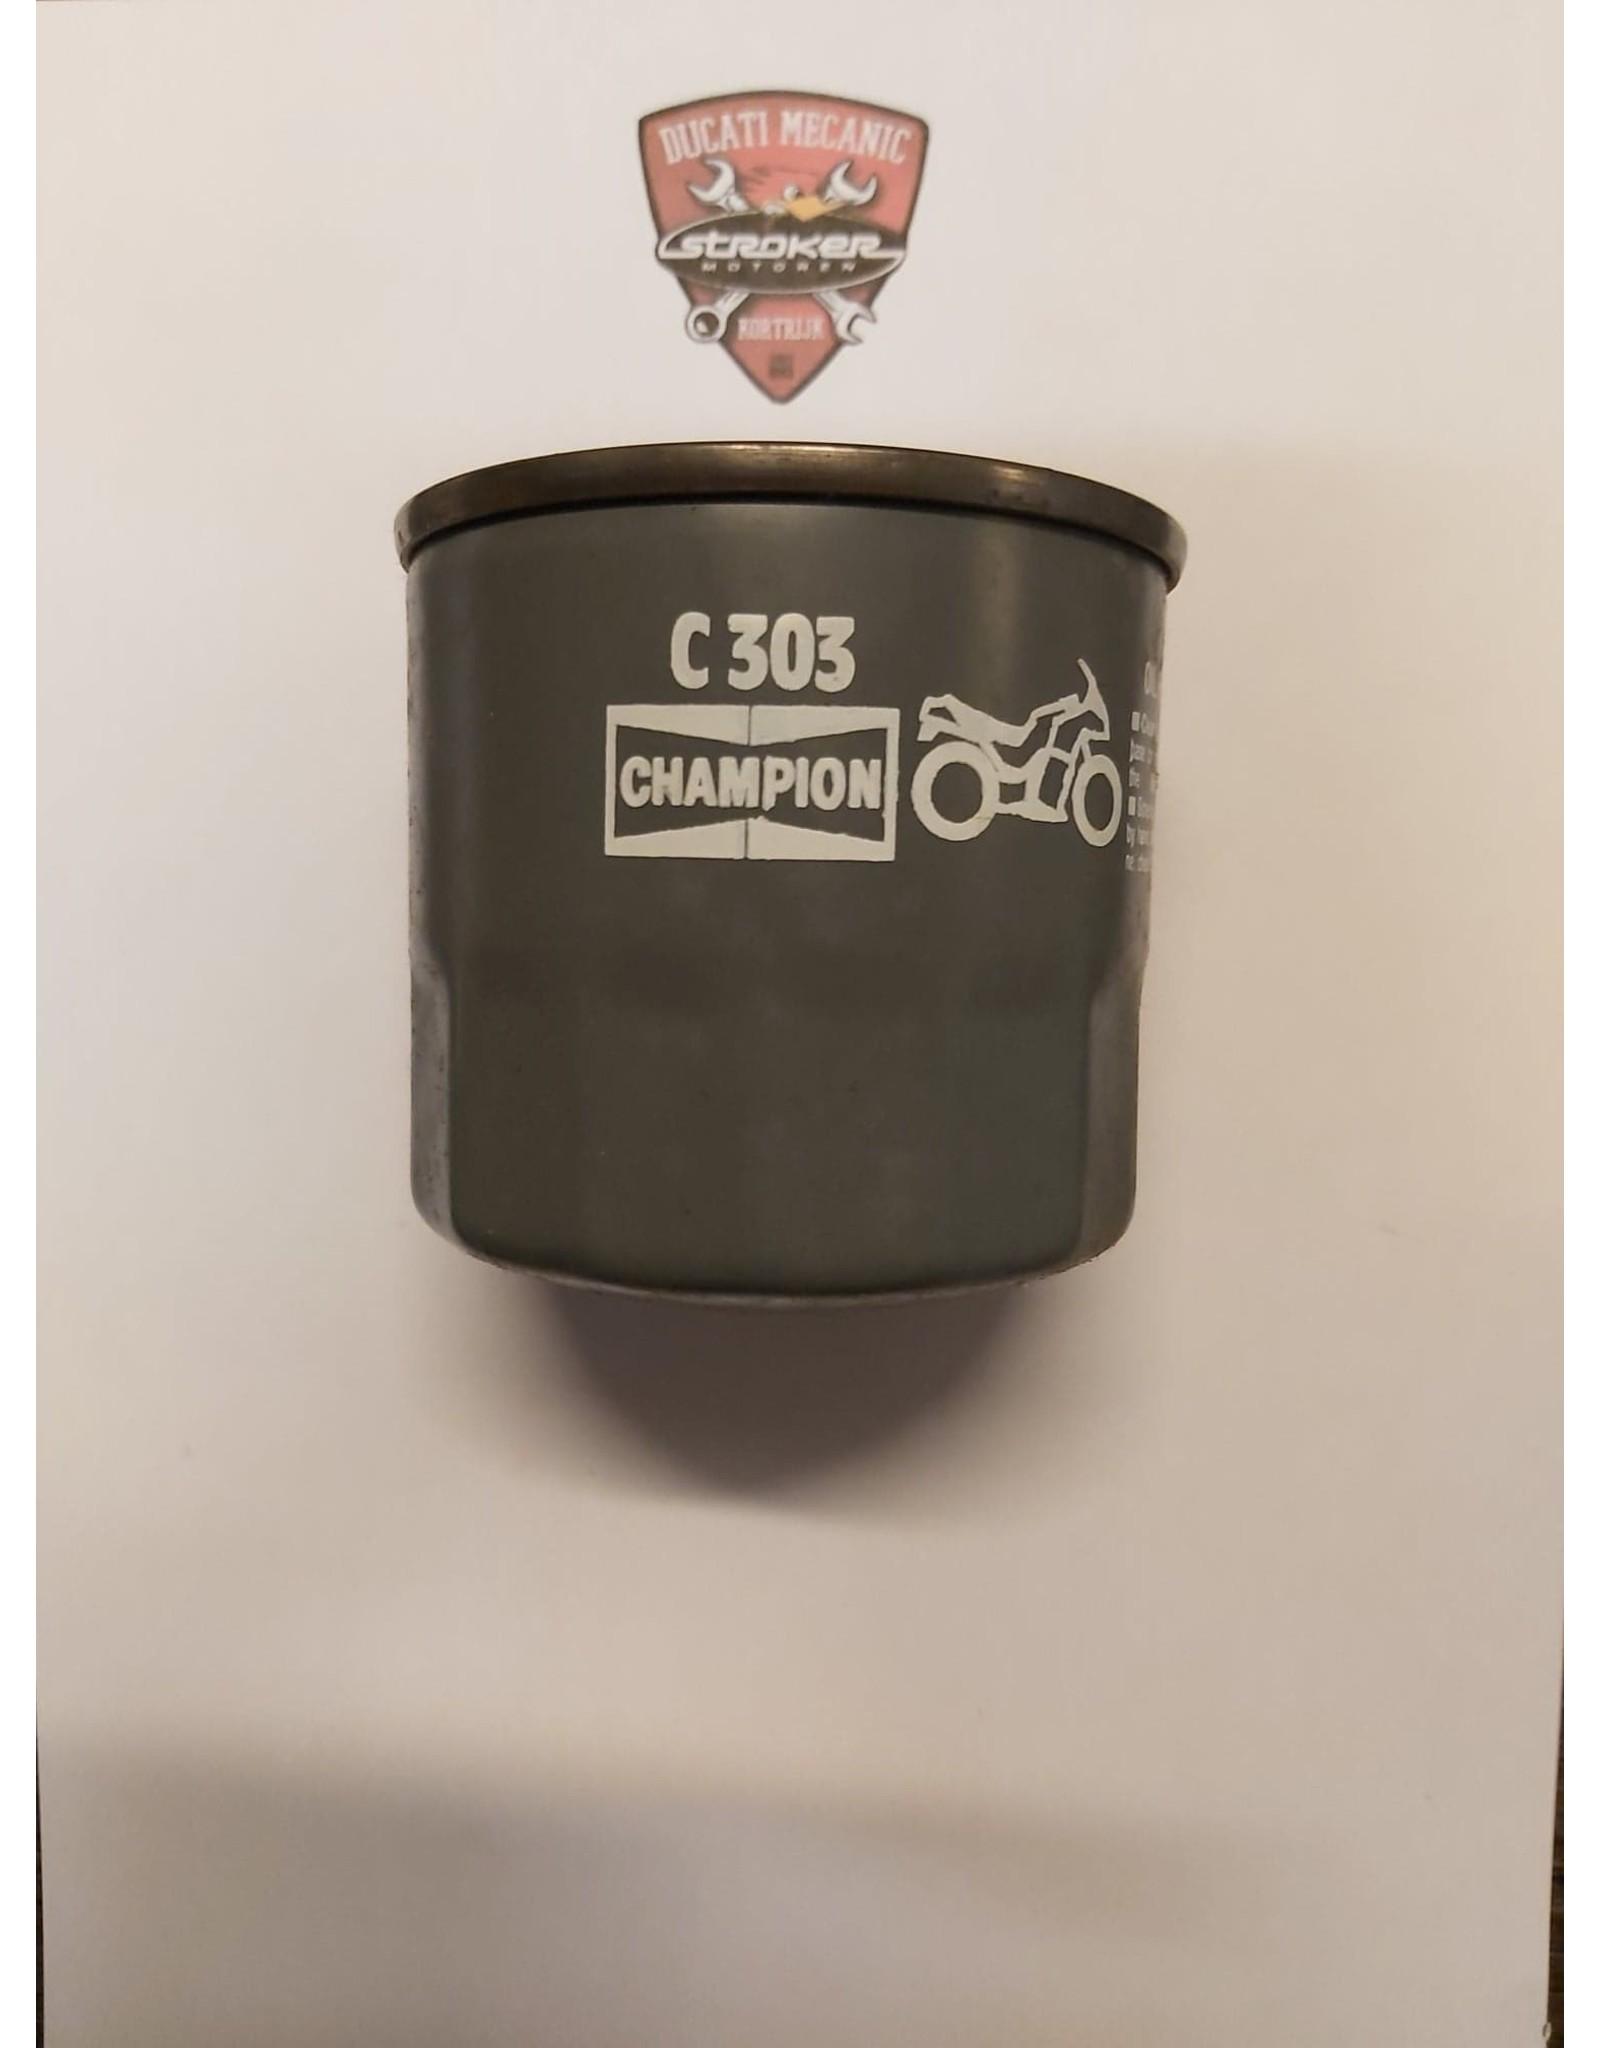 CHAMPION OLIEFILTER CHAMPION COF 303 (suzuki)